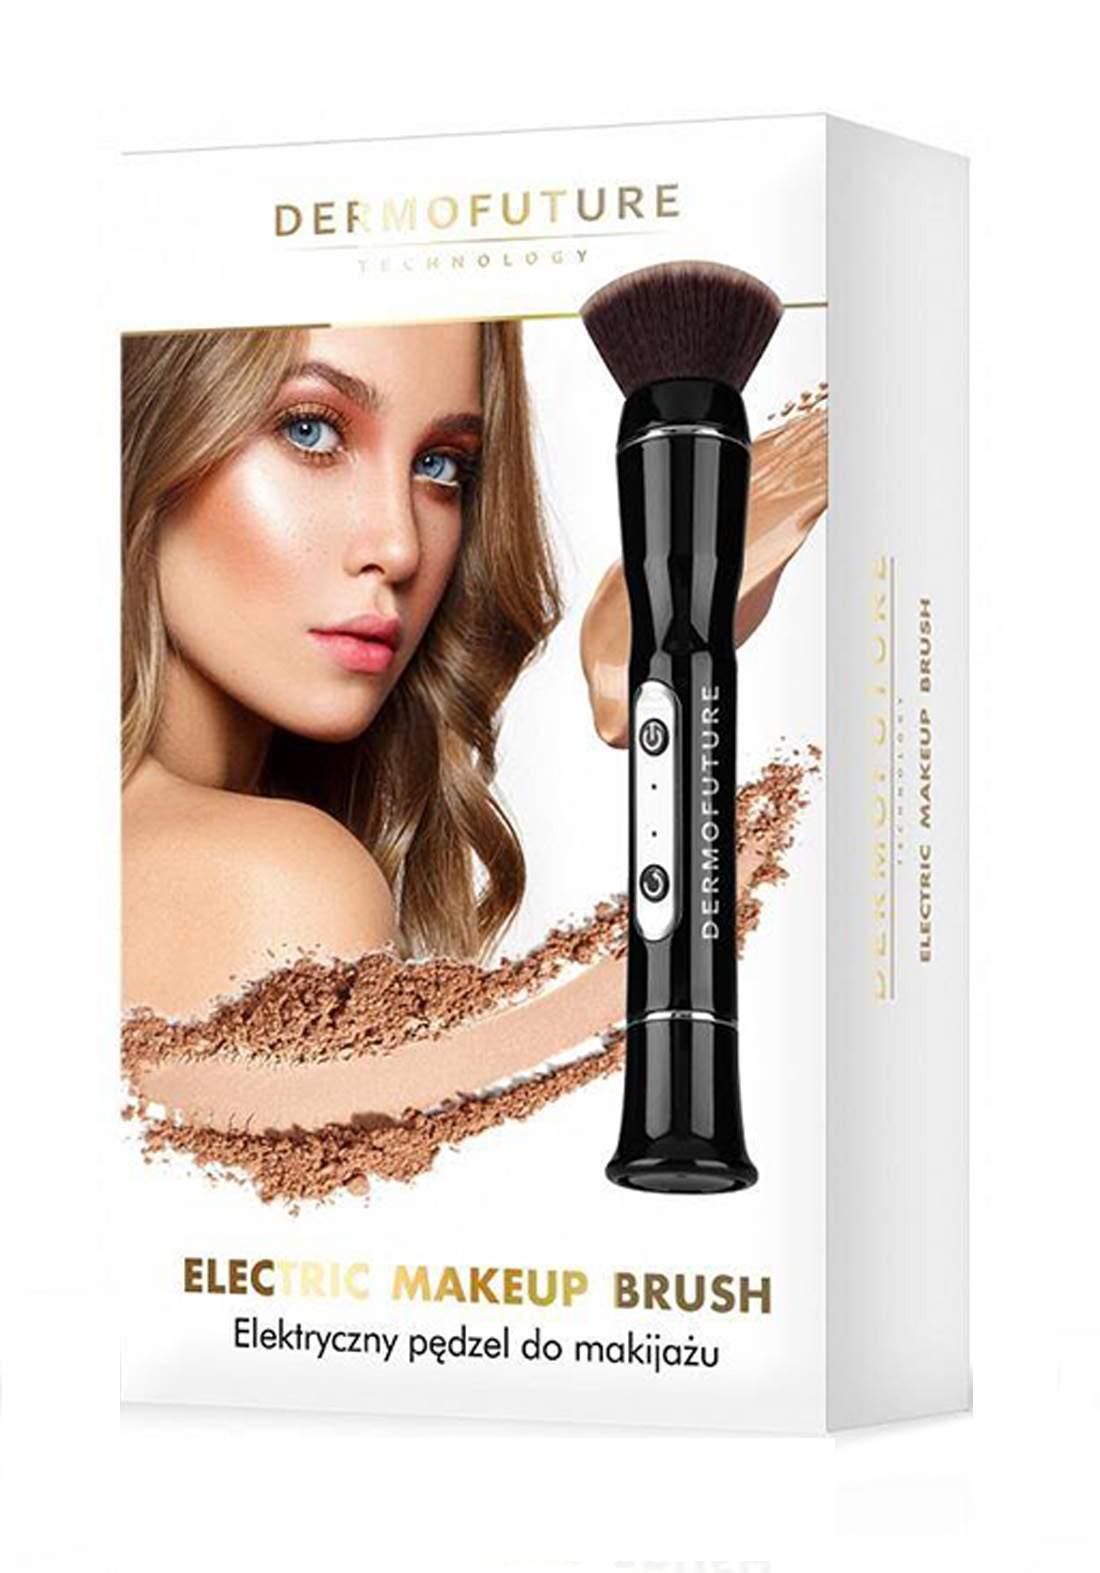 Dermofuture Electric Makeup Brush فرشاة المكياج الكهربائية